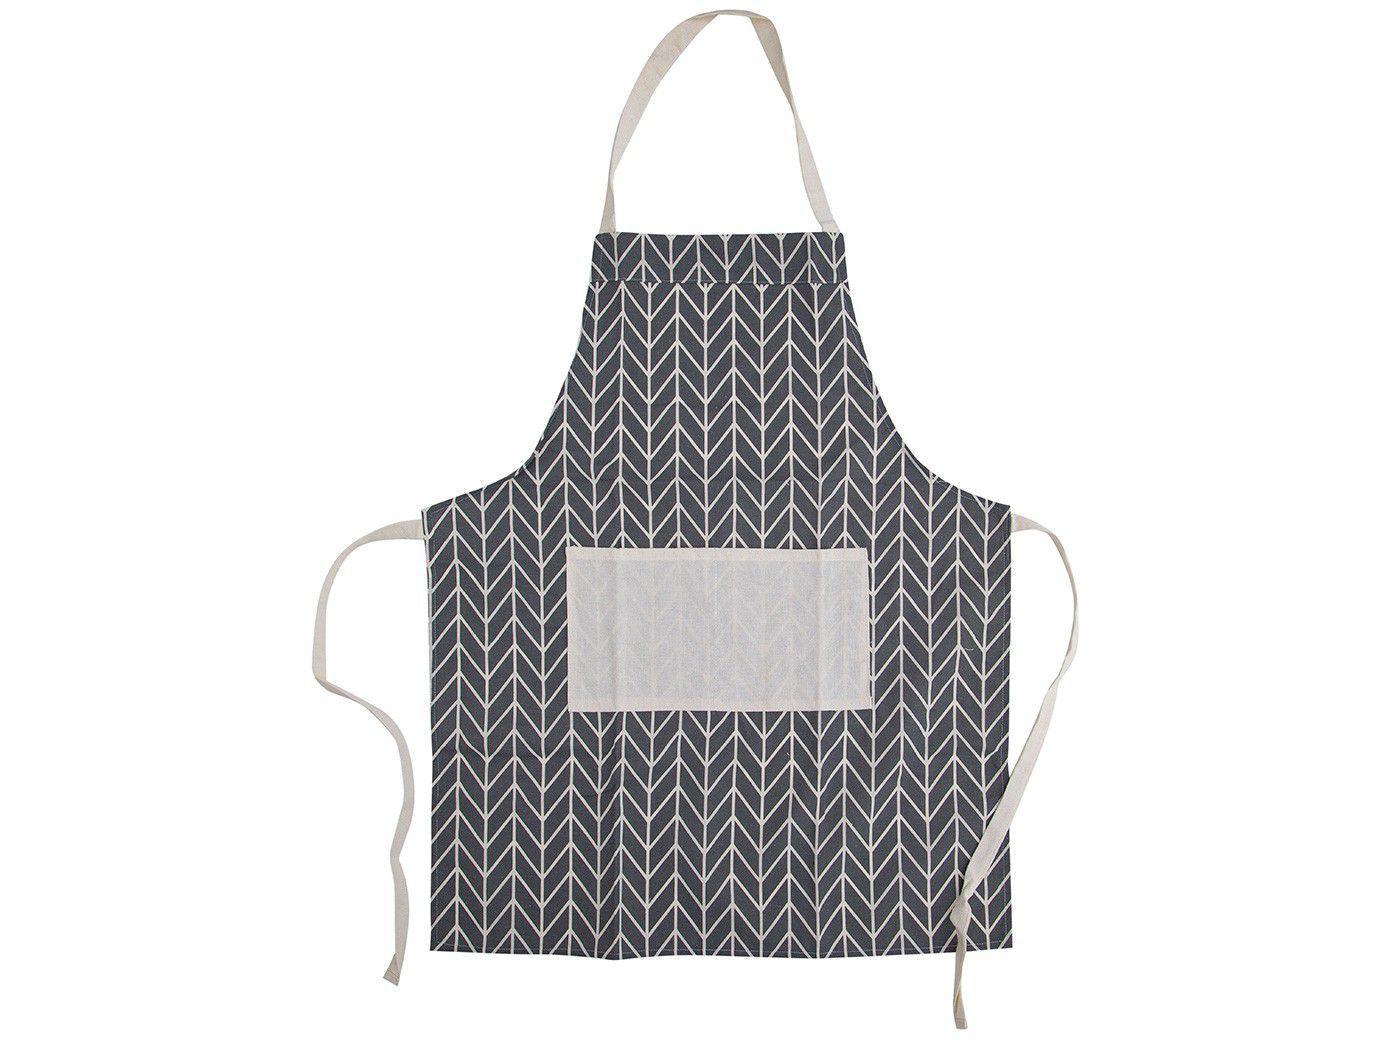 Avental de Cozinha com Bolso Jolitex Ternille - Design Merci Geométrico Cinza e Branco